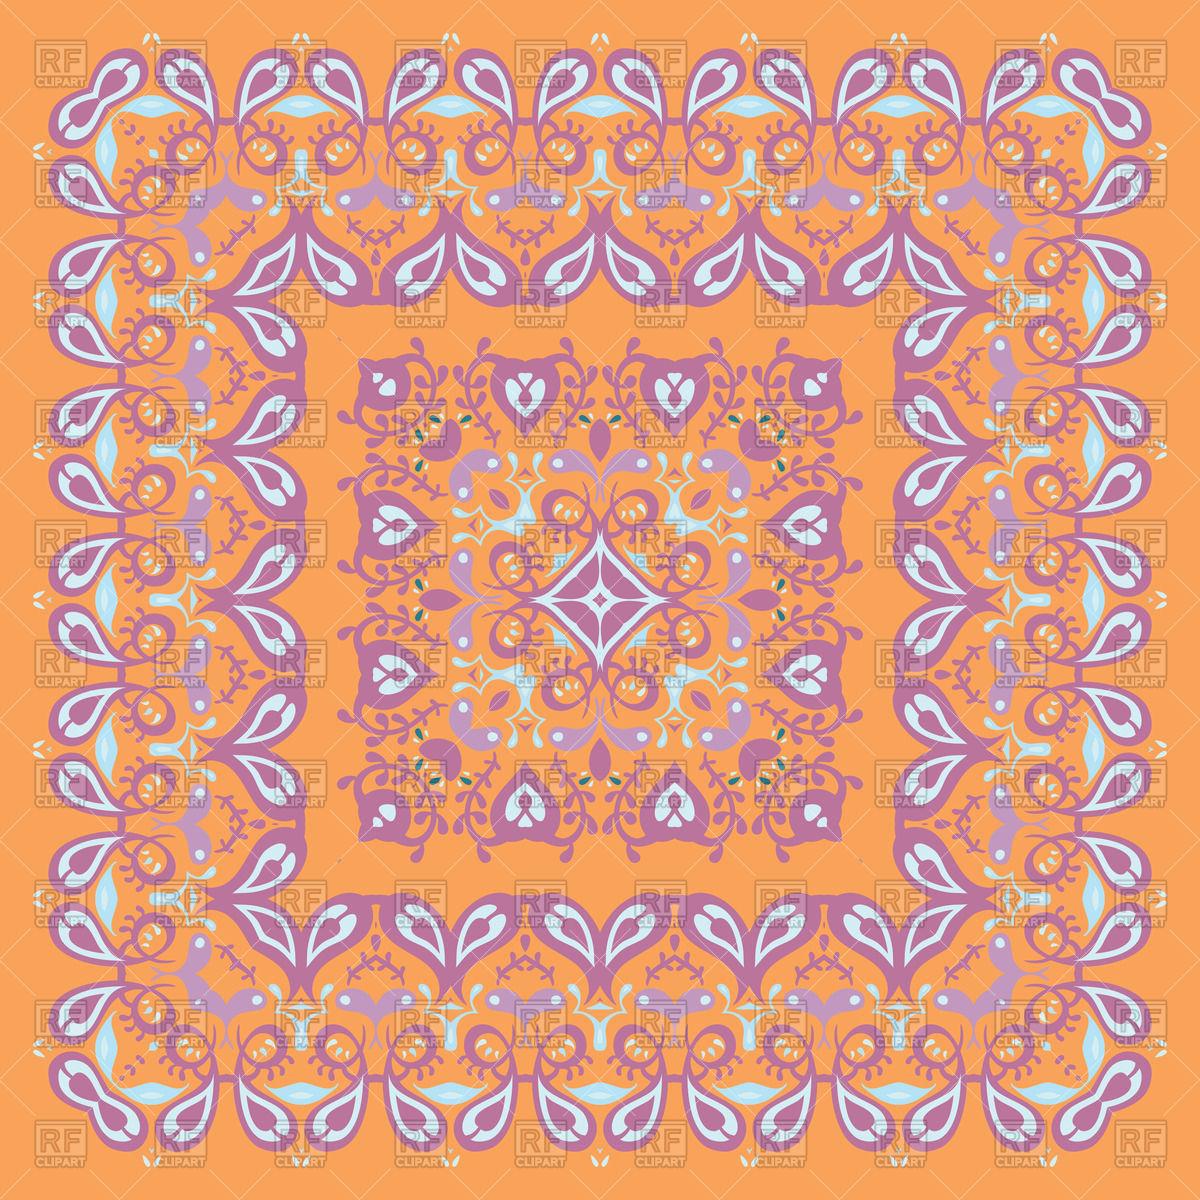 1200x1200 Orange Bandana Or Carpet Pattern Vector Image Vector Artwork Of